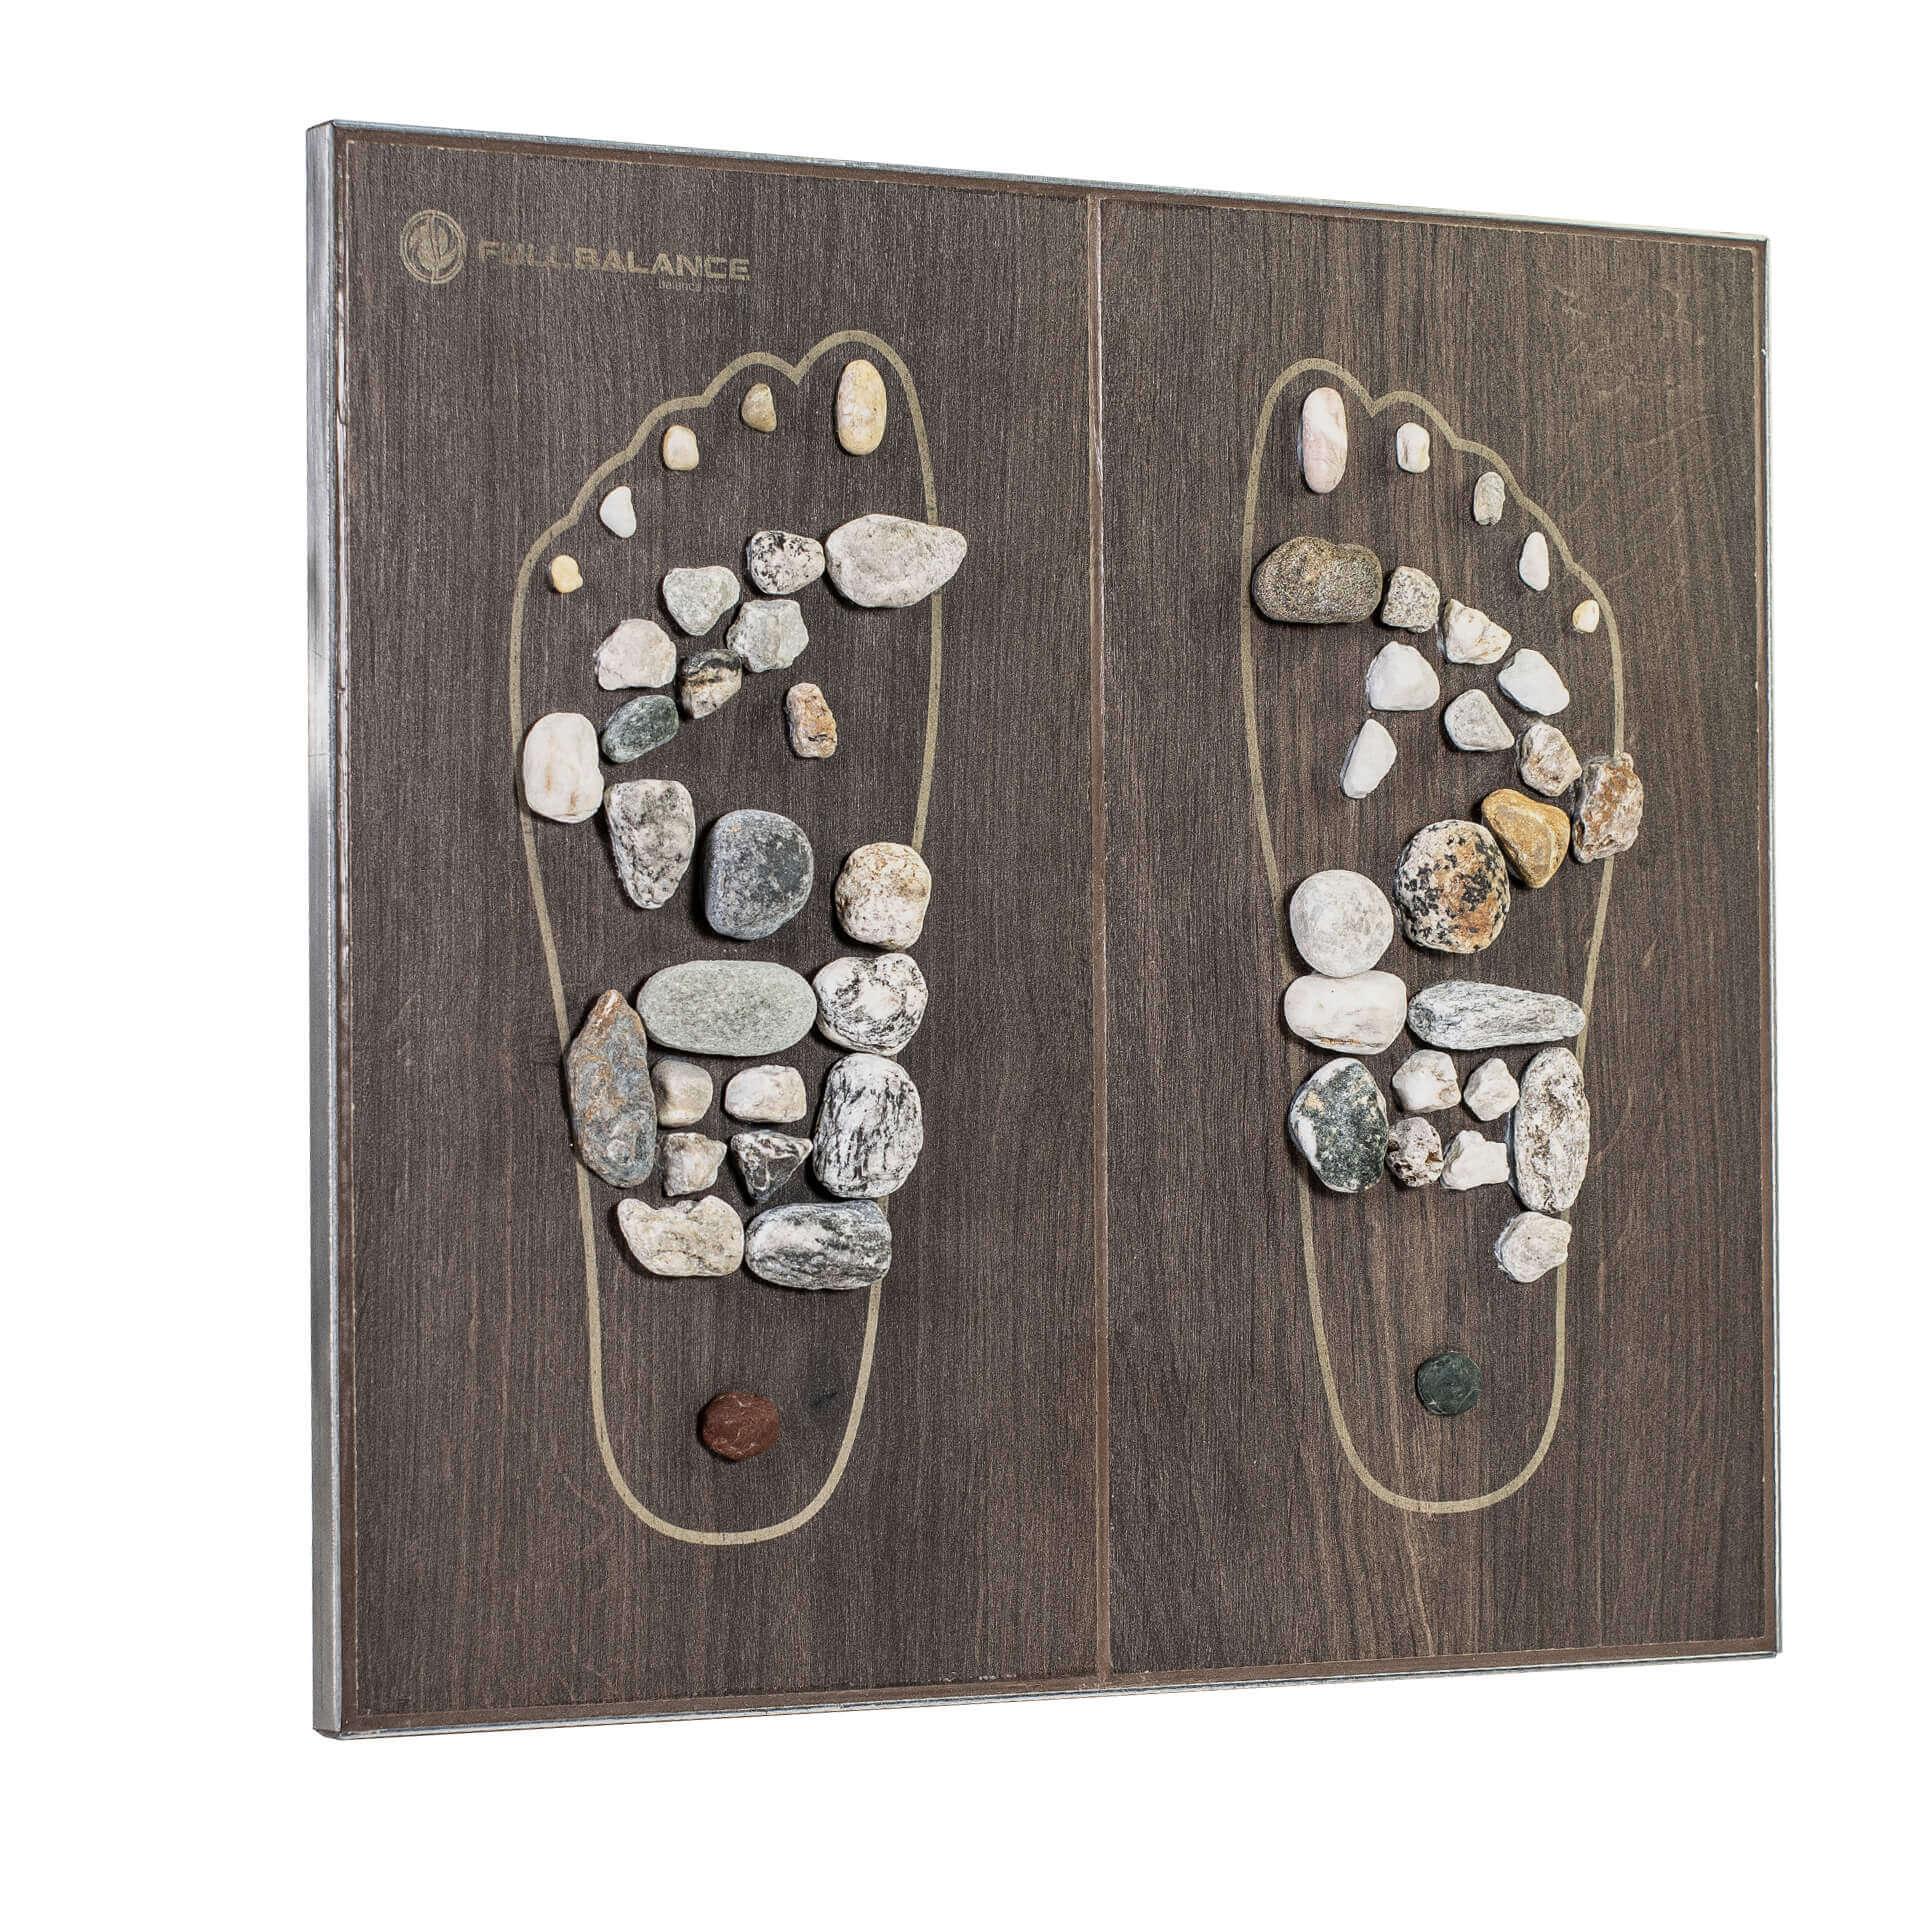 Tile & Stone Fußreflexzonenmassage Platte